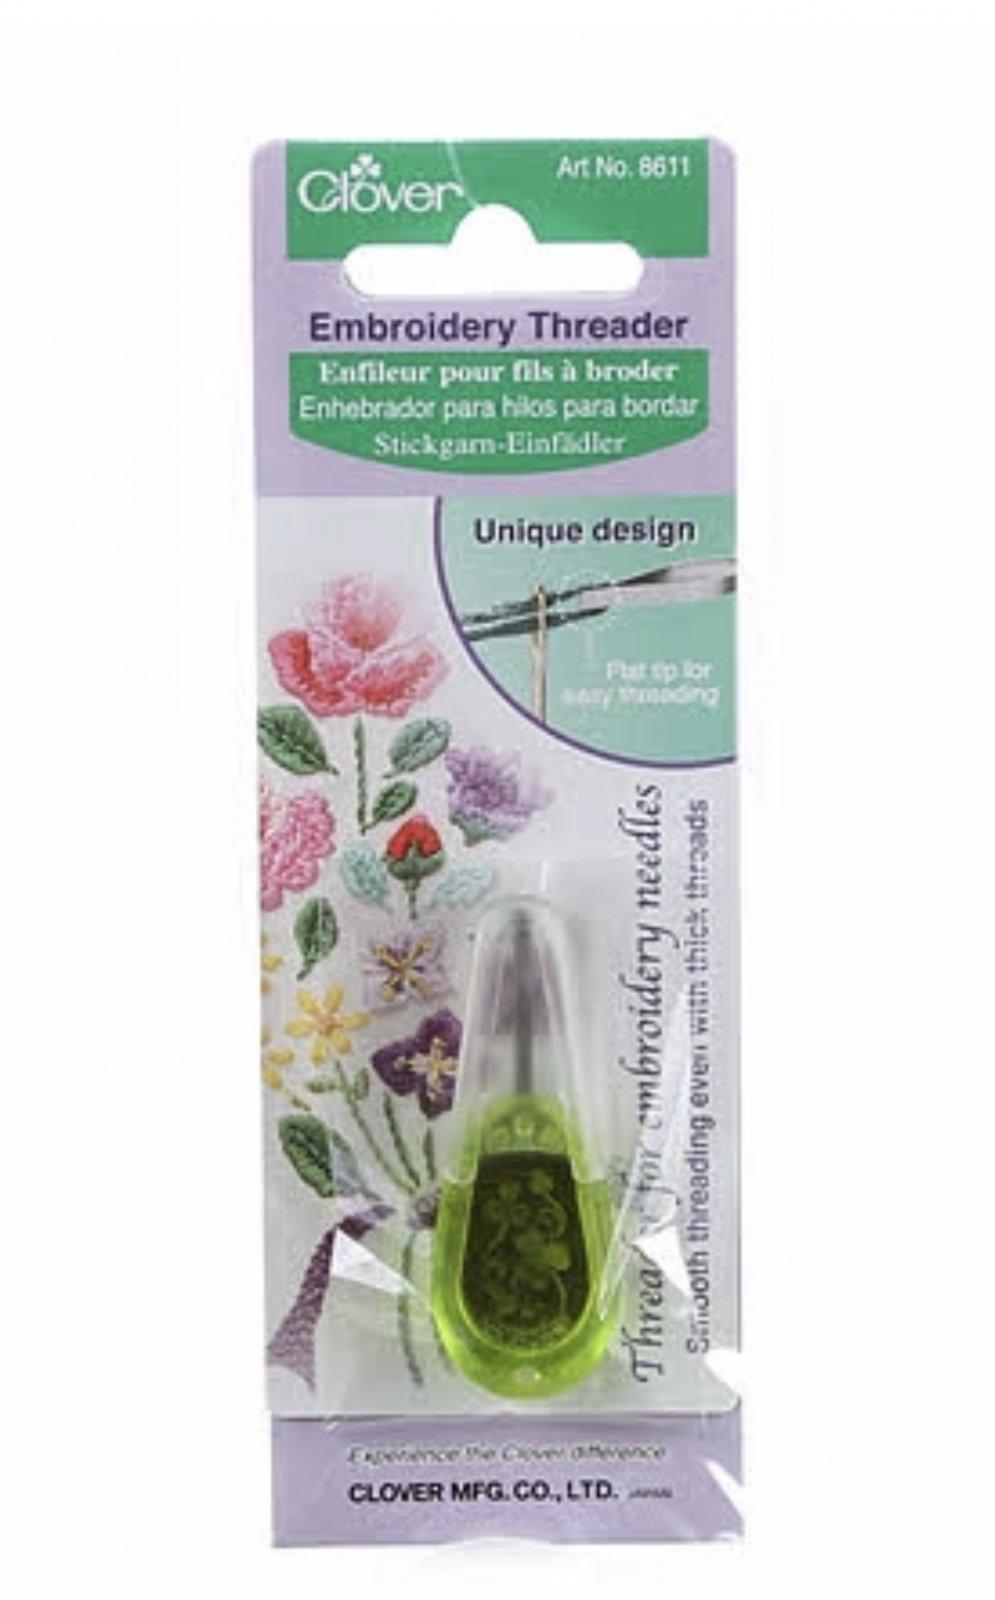 Embroidery Needle Threader